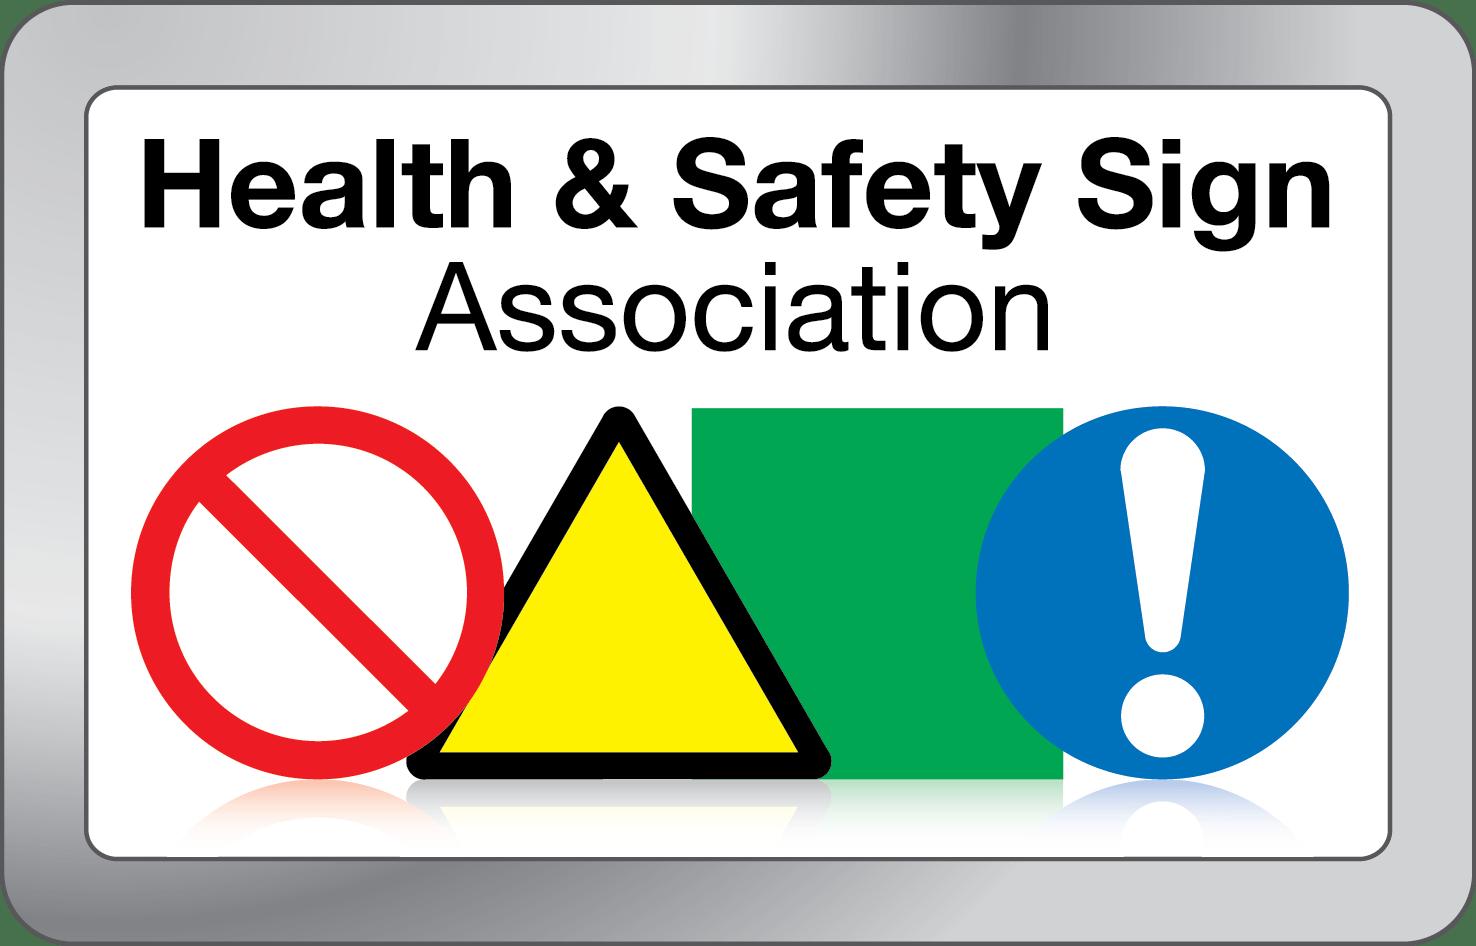 HSSA – Health & Safety Sign Association